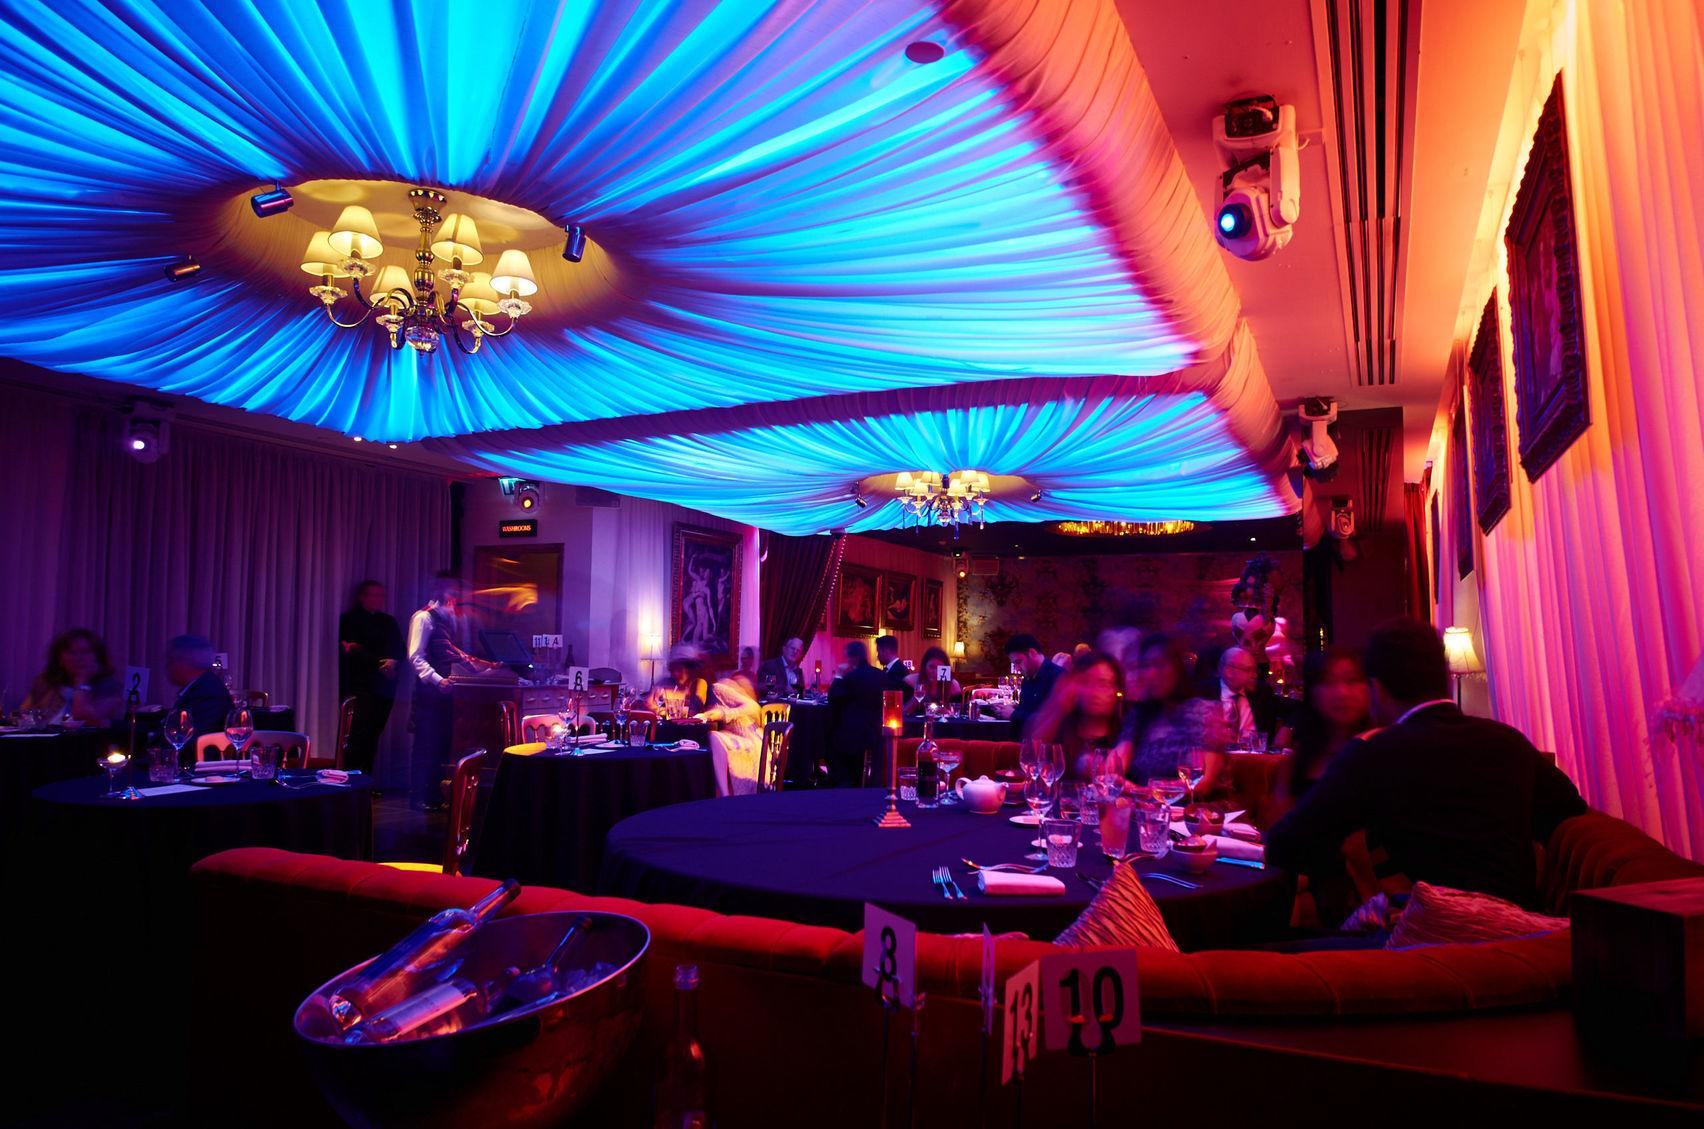 Baroque, Playboy Club London